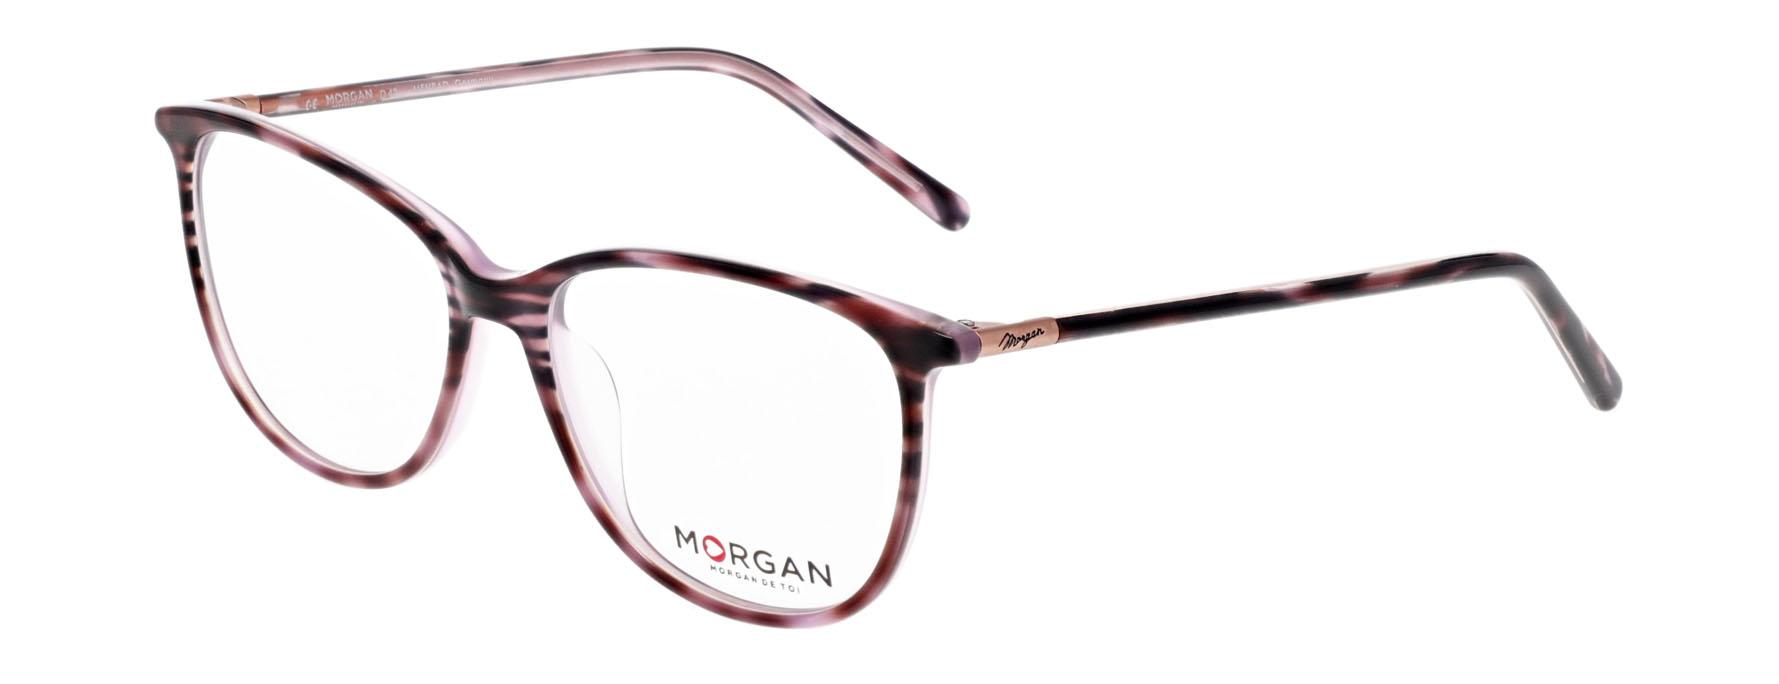 Morgan 202023 4796